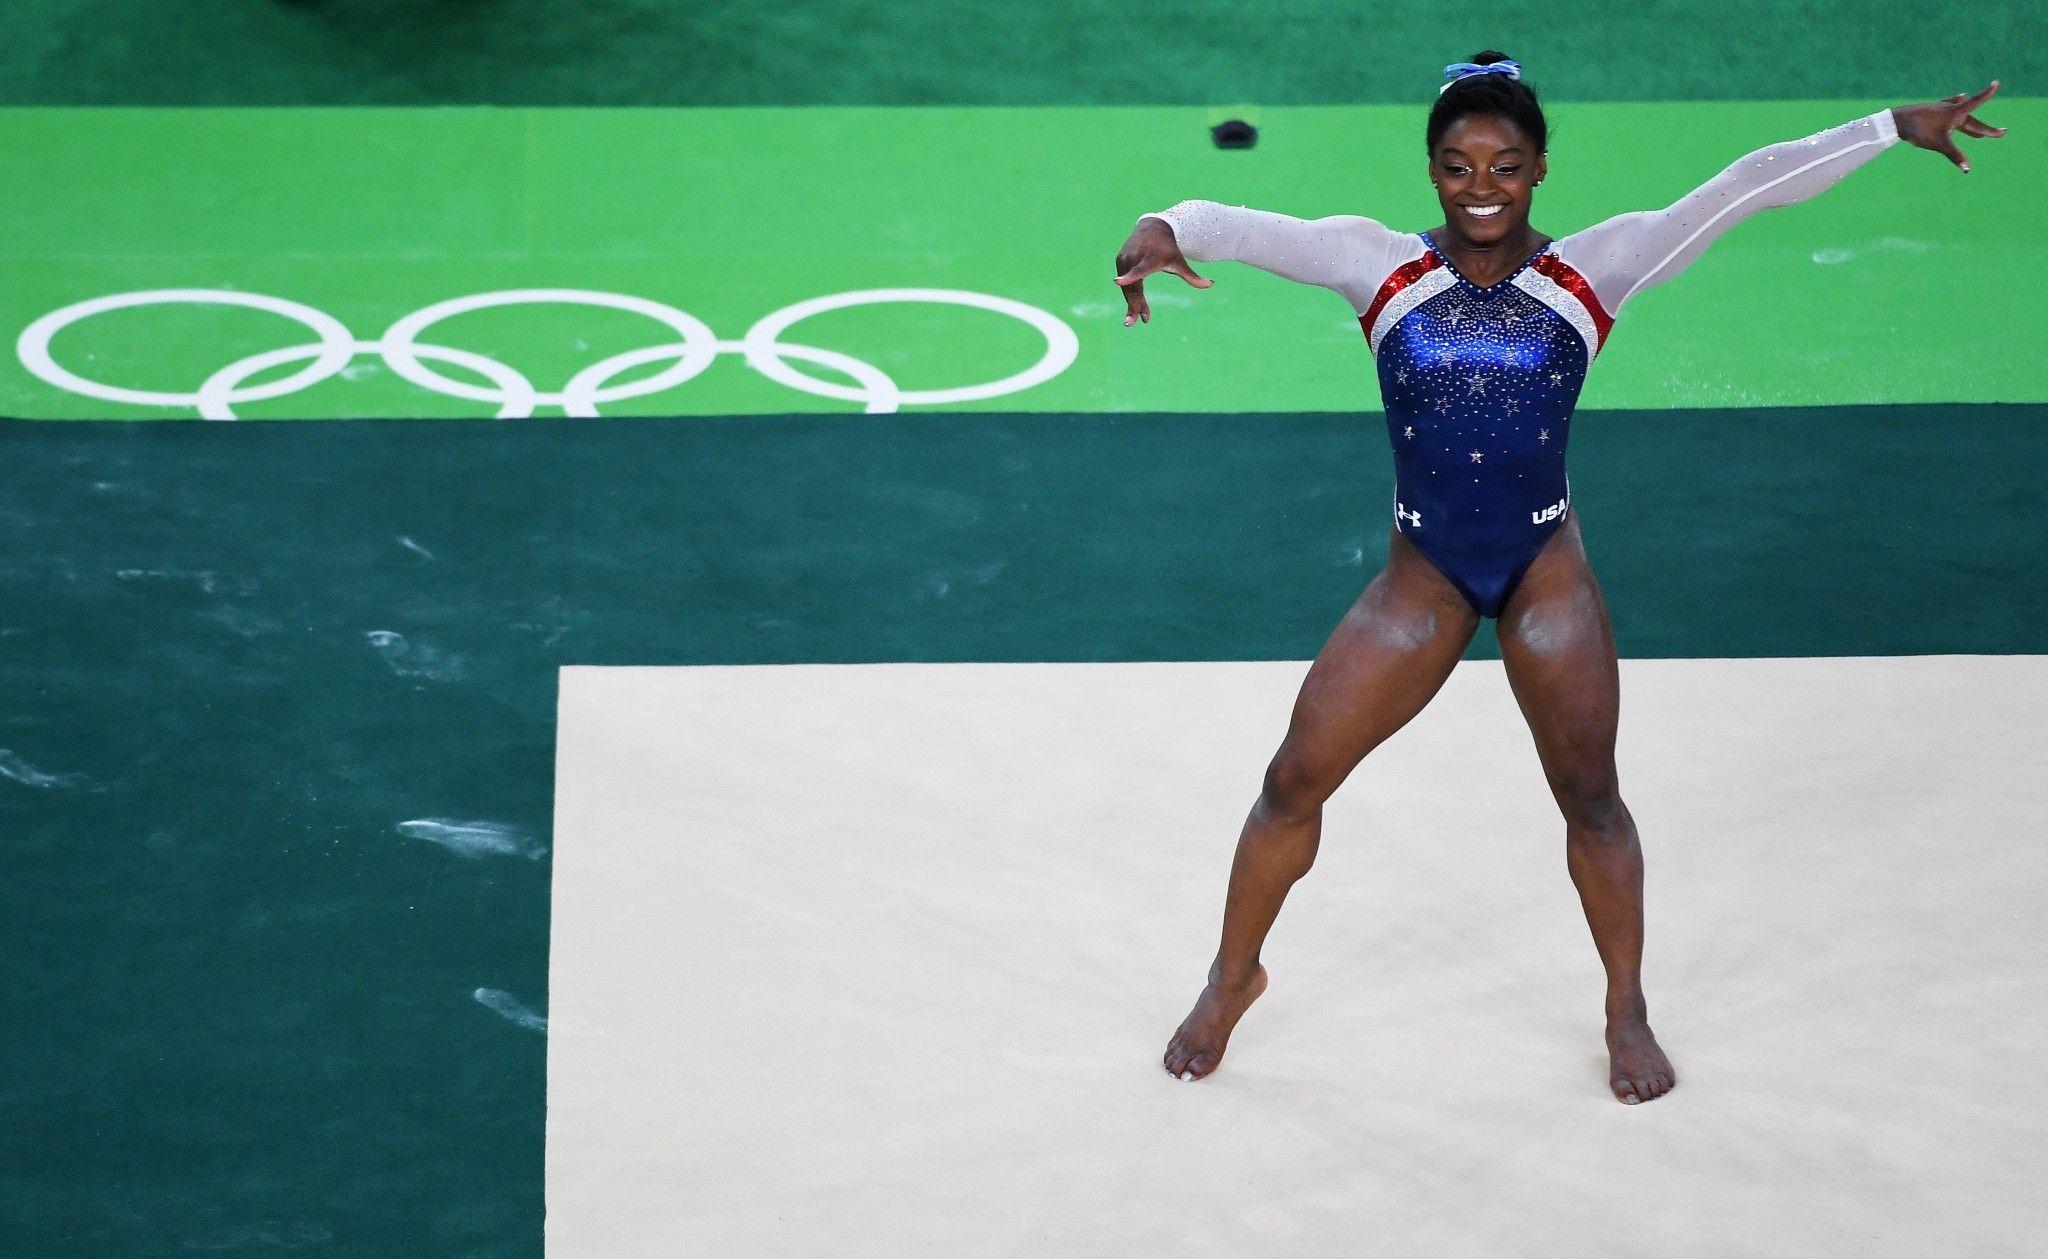 Simone Biles wins floor exercise for fourth gold medal of